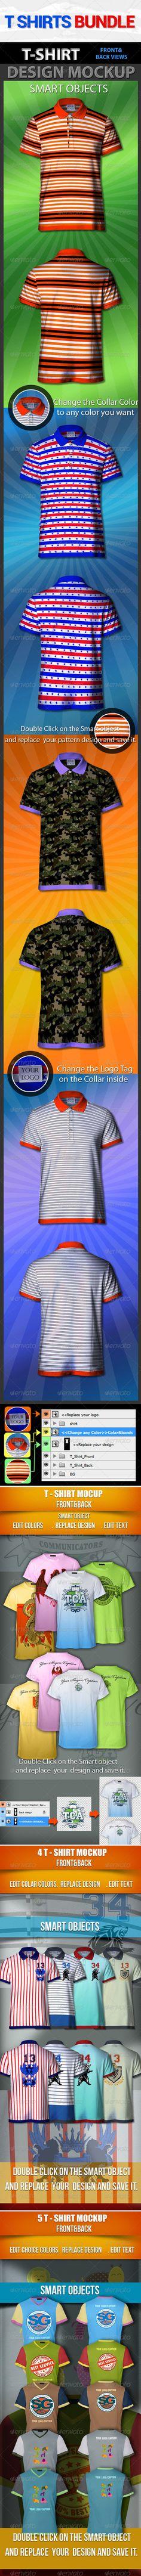 Dress UP: T-Shirts Mock-Up Bundle